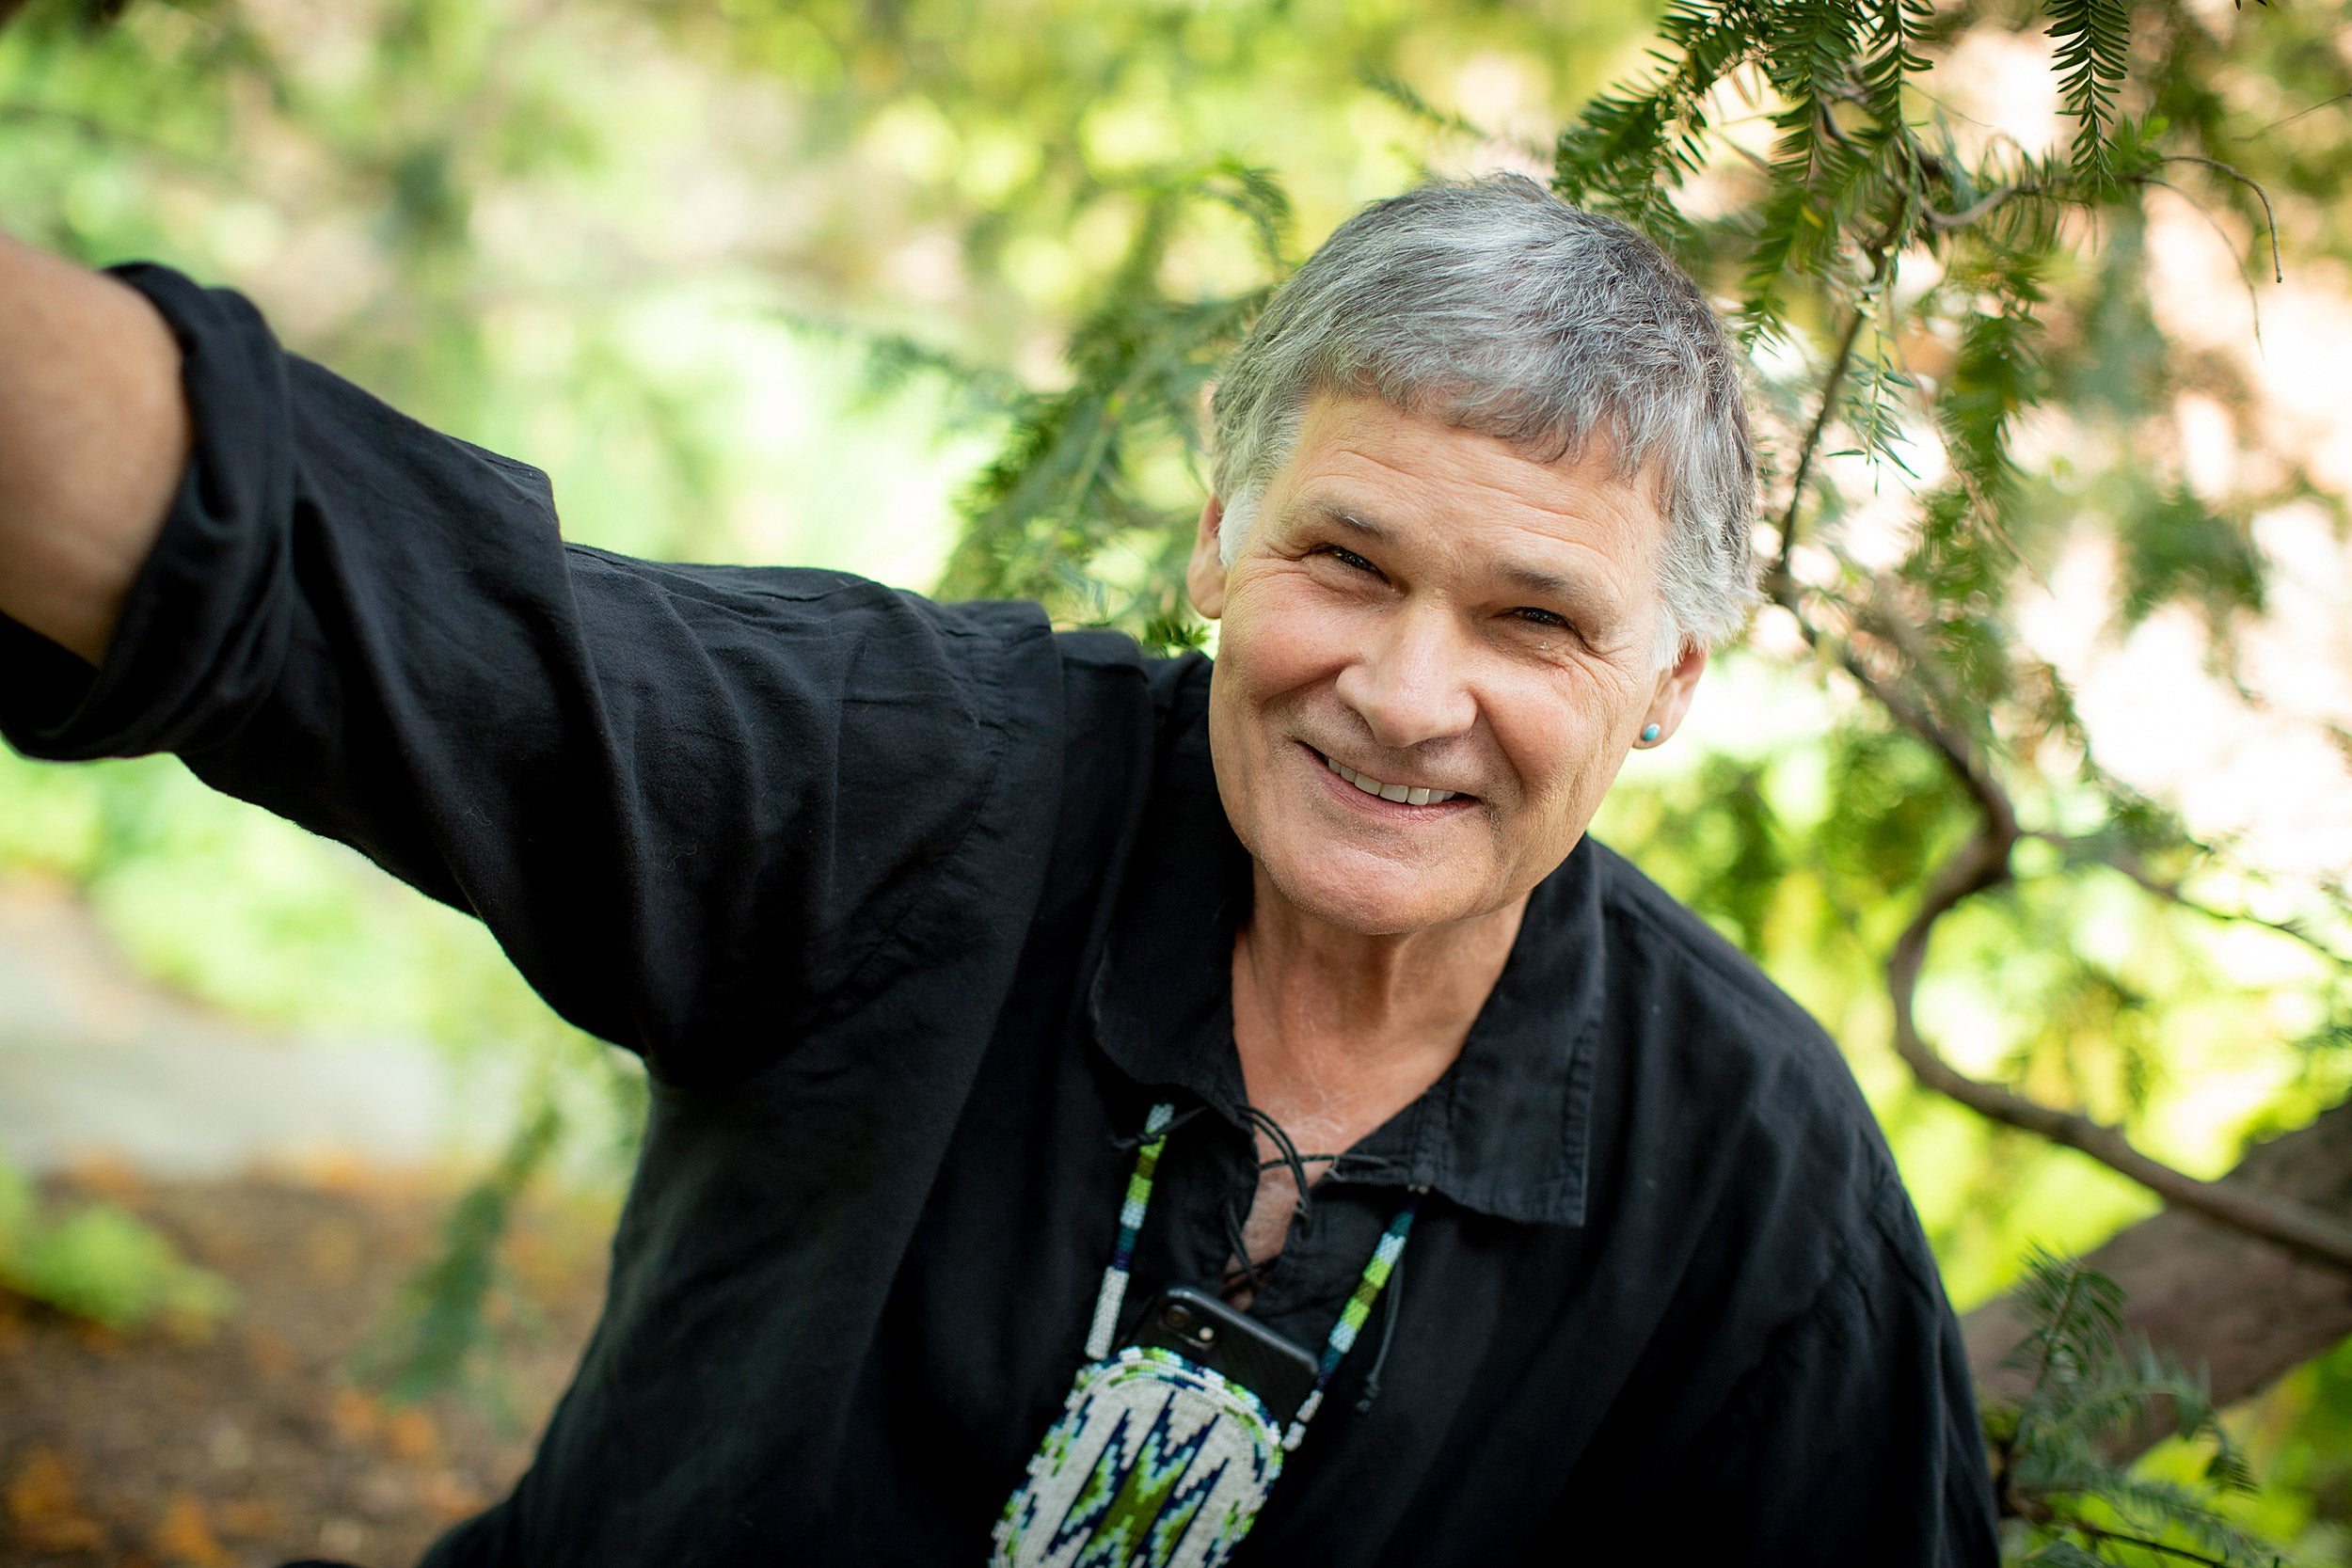 Retiring Kennedy School professor looks to help his Native American brethren